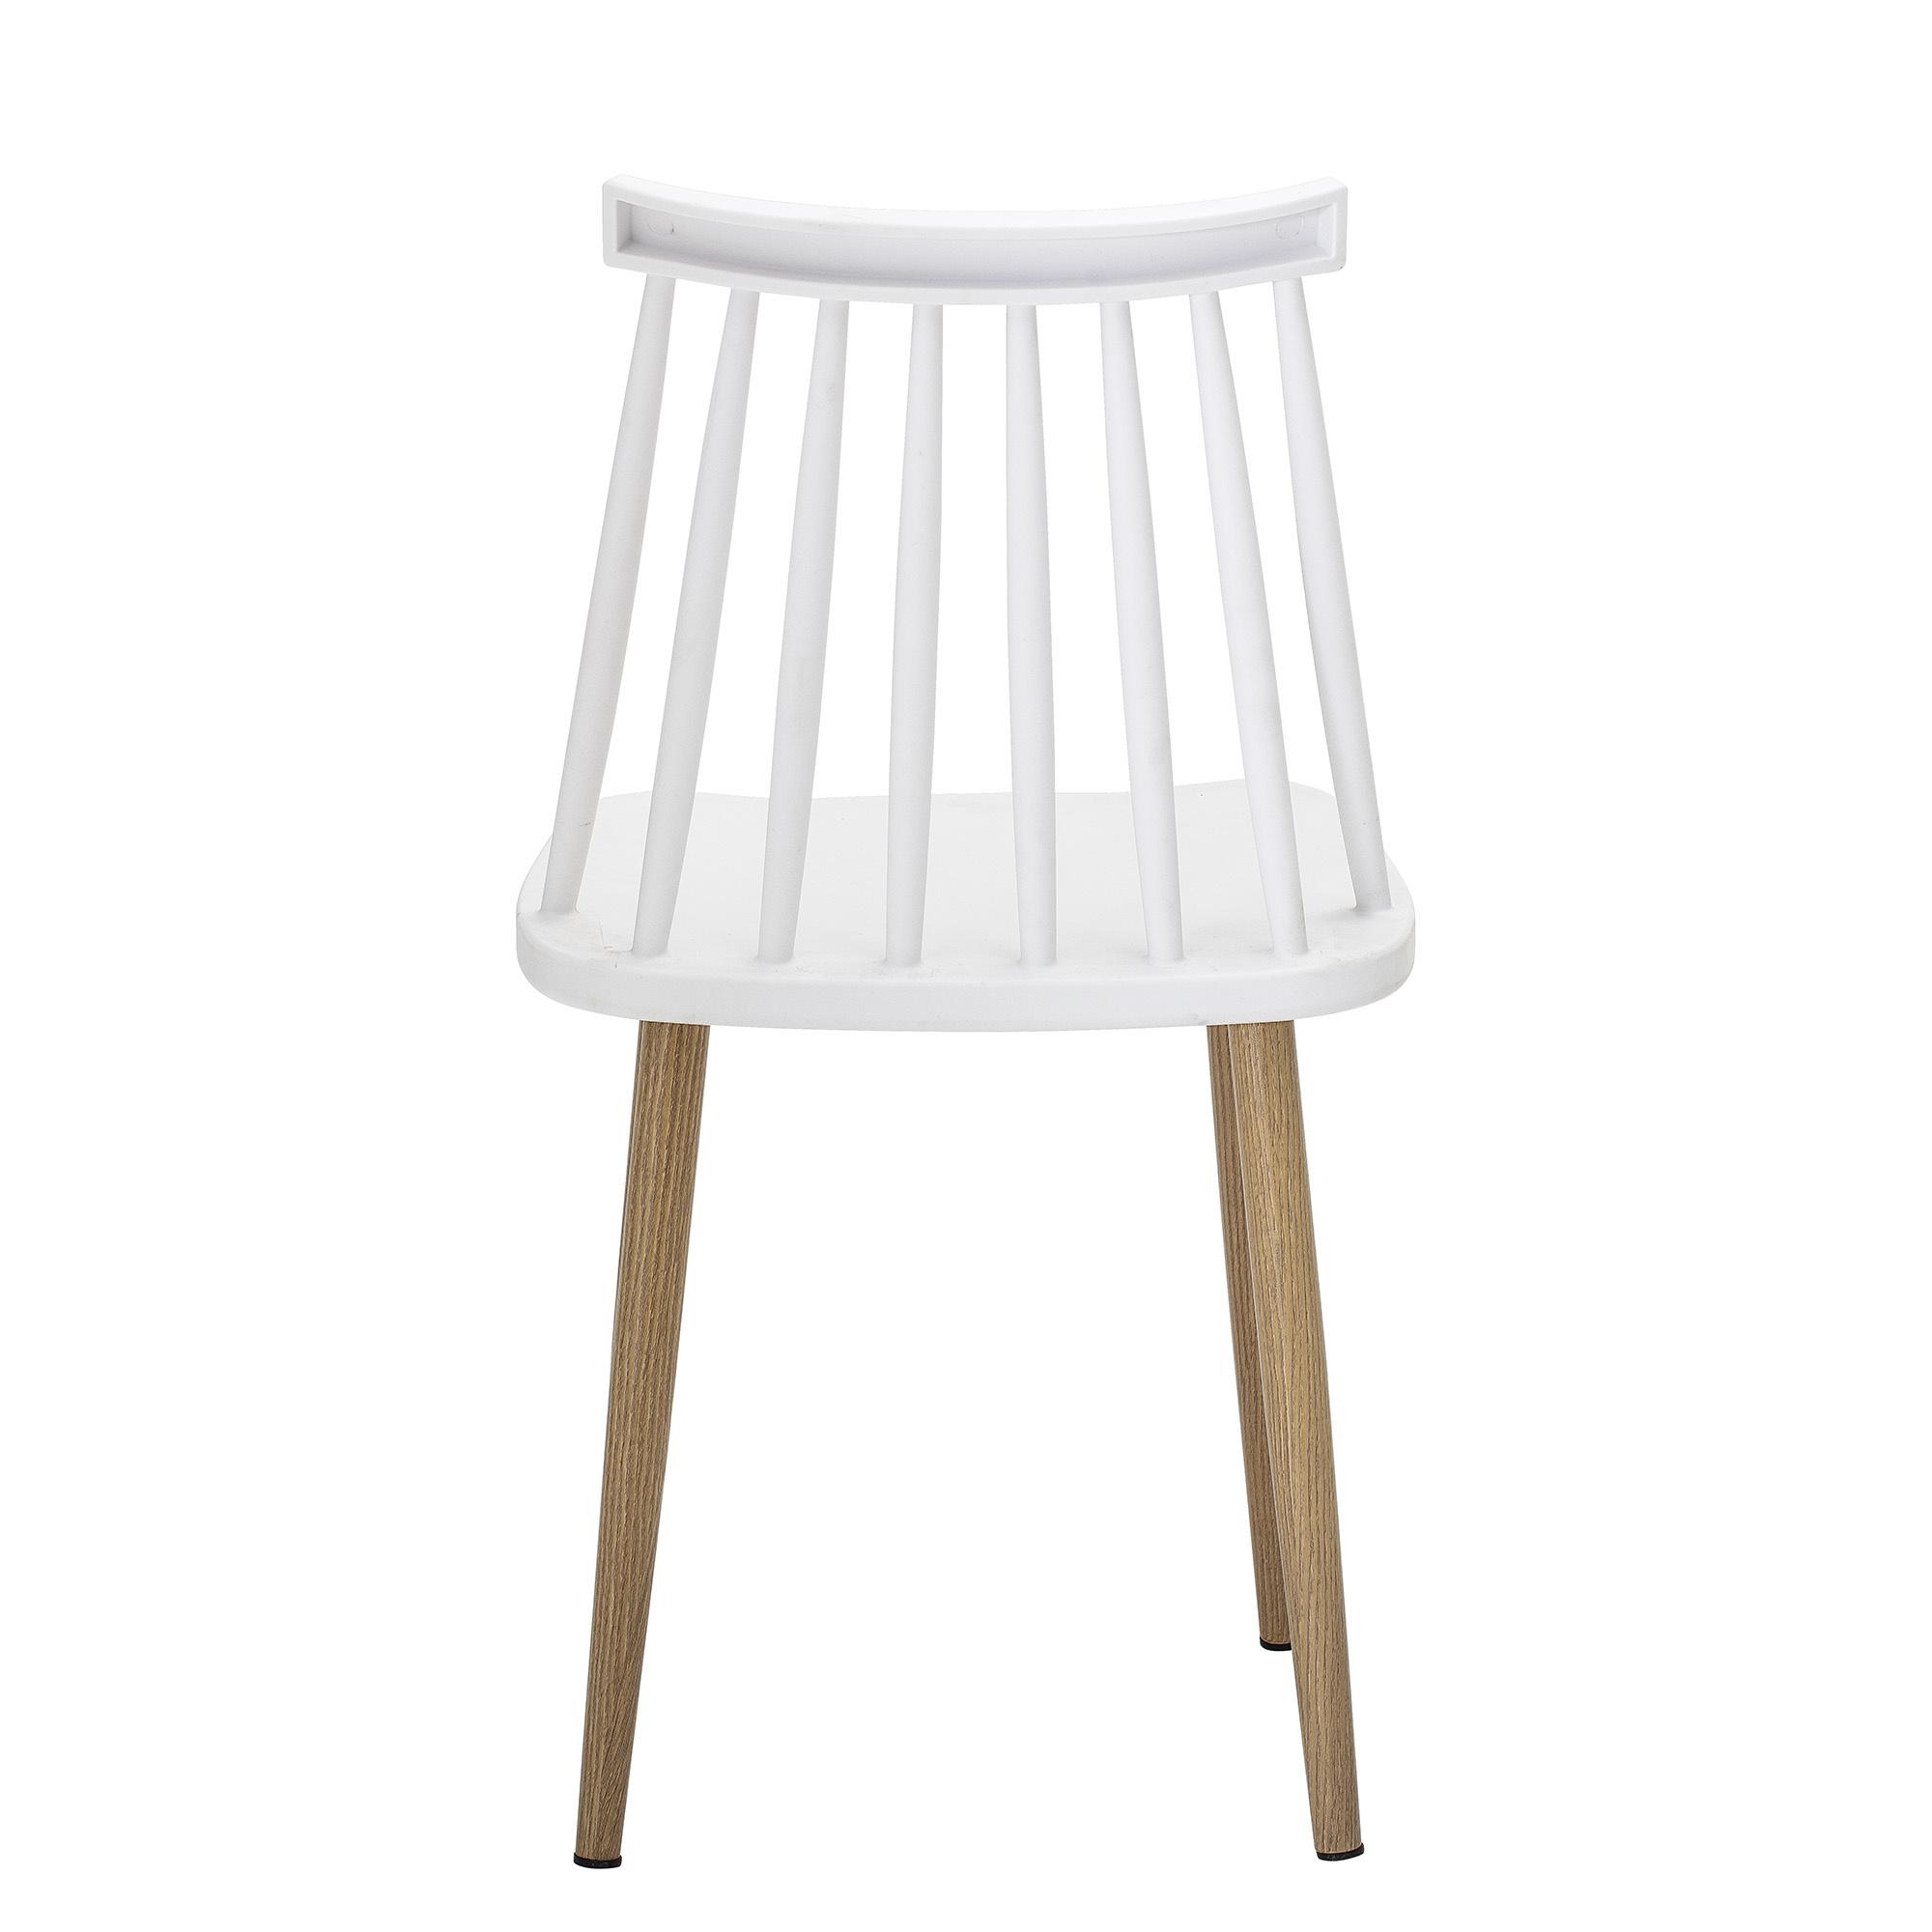 Bloomingville Bajo Chair, White, Plastic - L42xH80xW42cm - Bloomingville